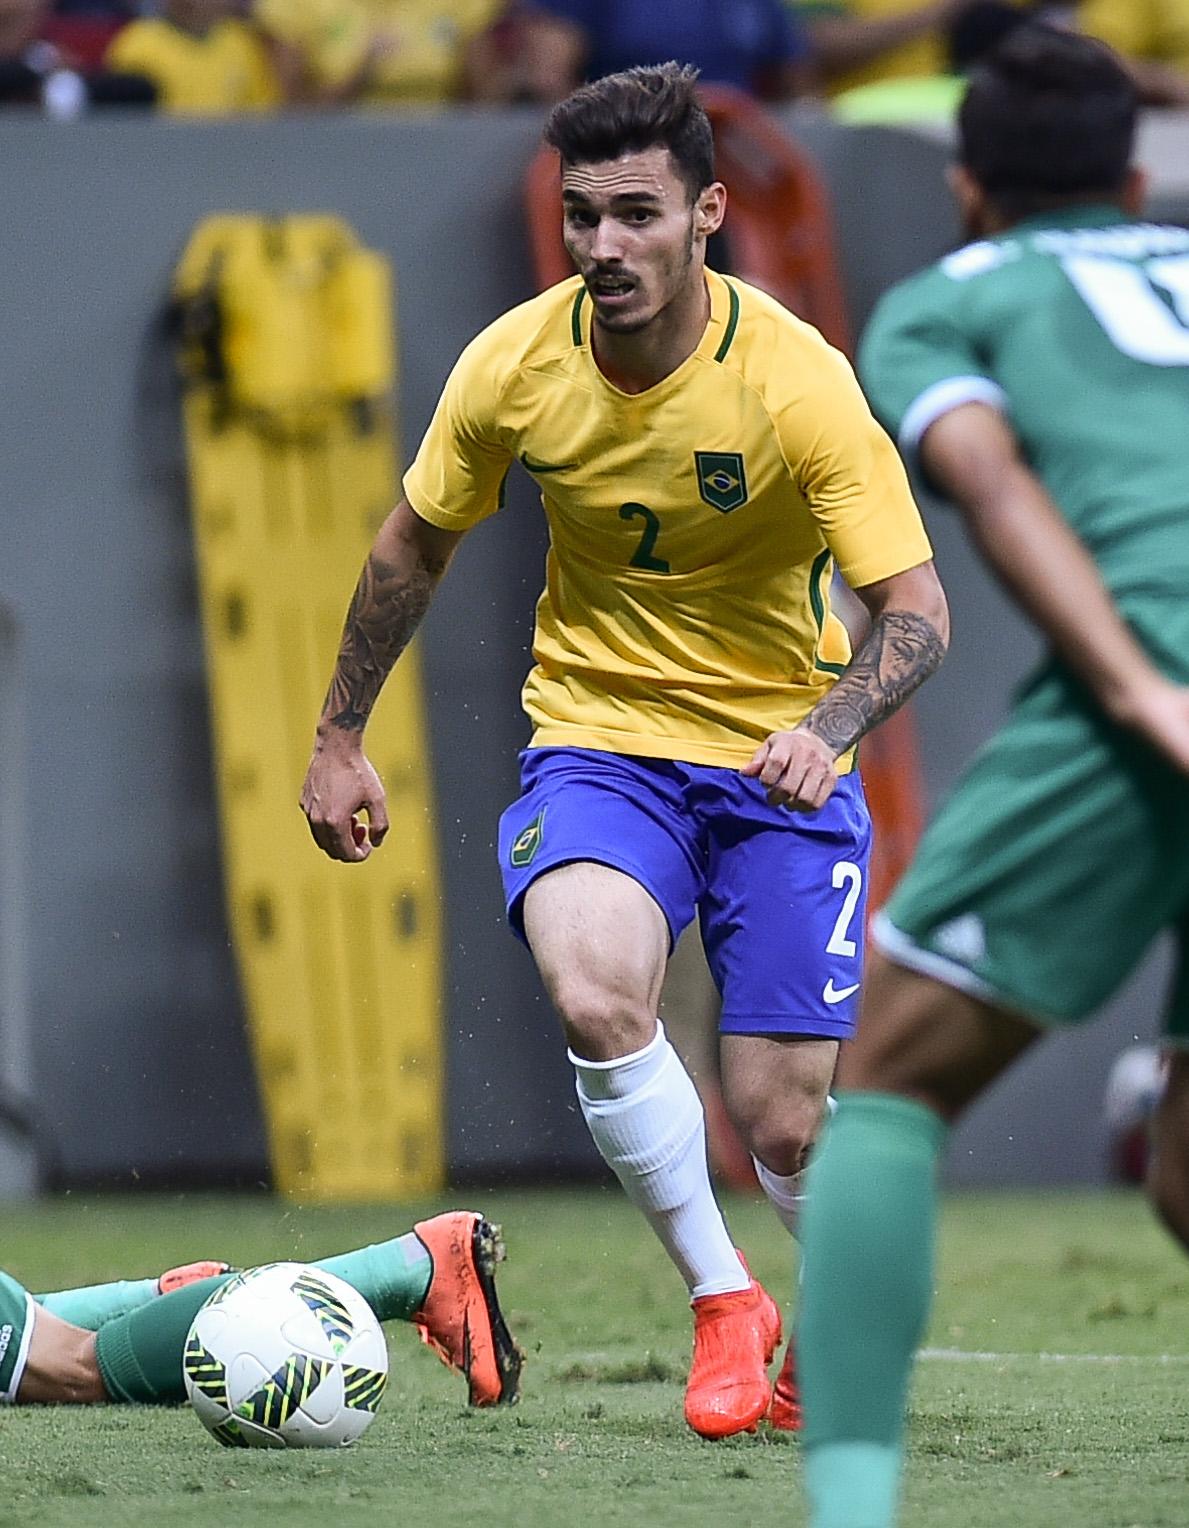 Zeca (Brazilian footballer) - Wikipedia